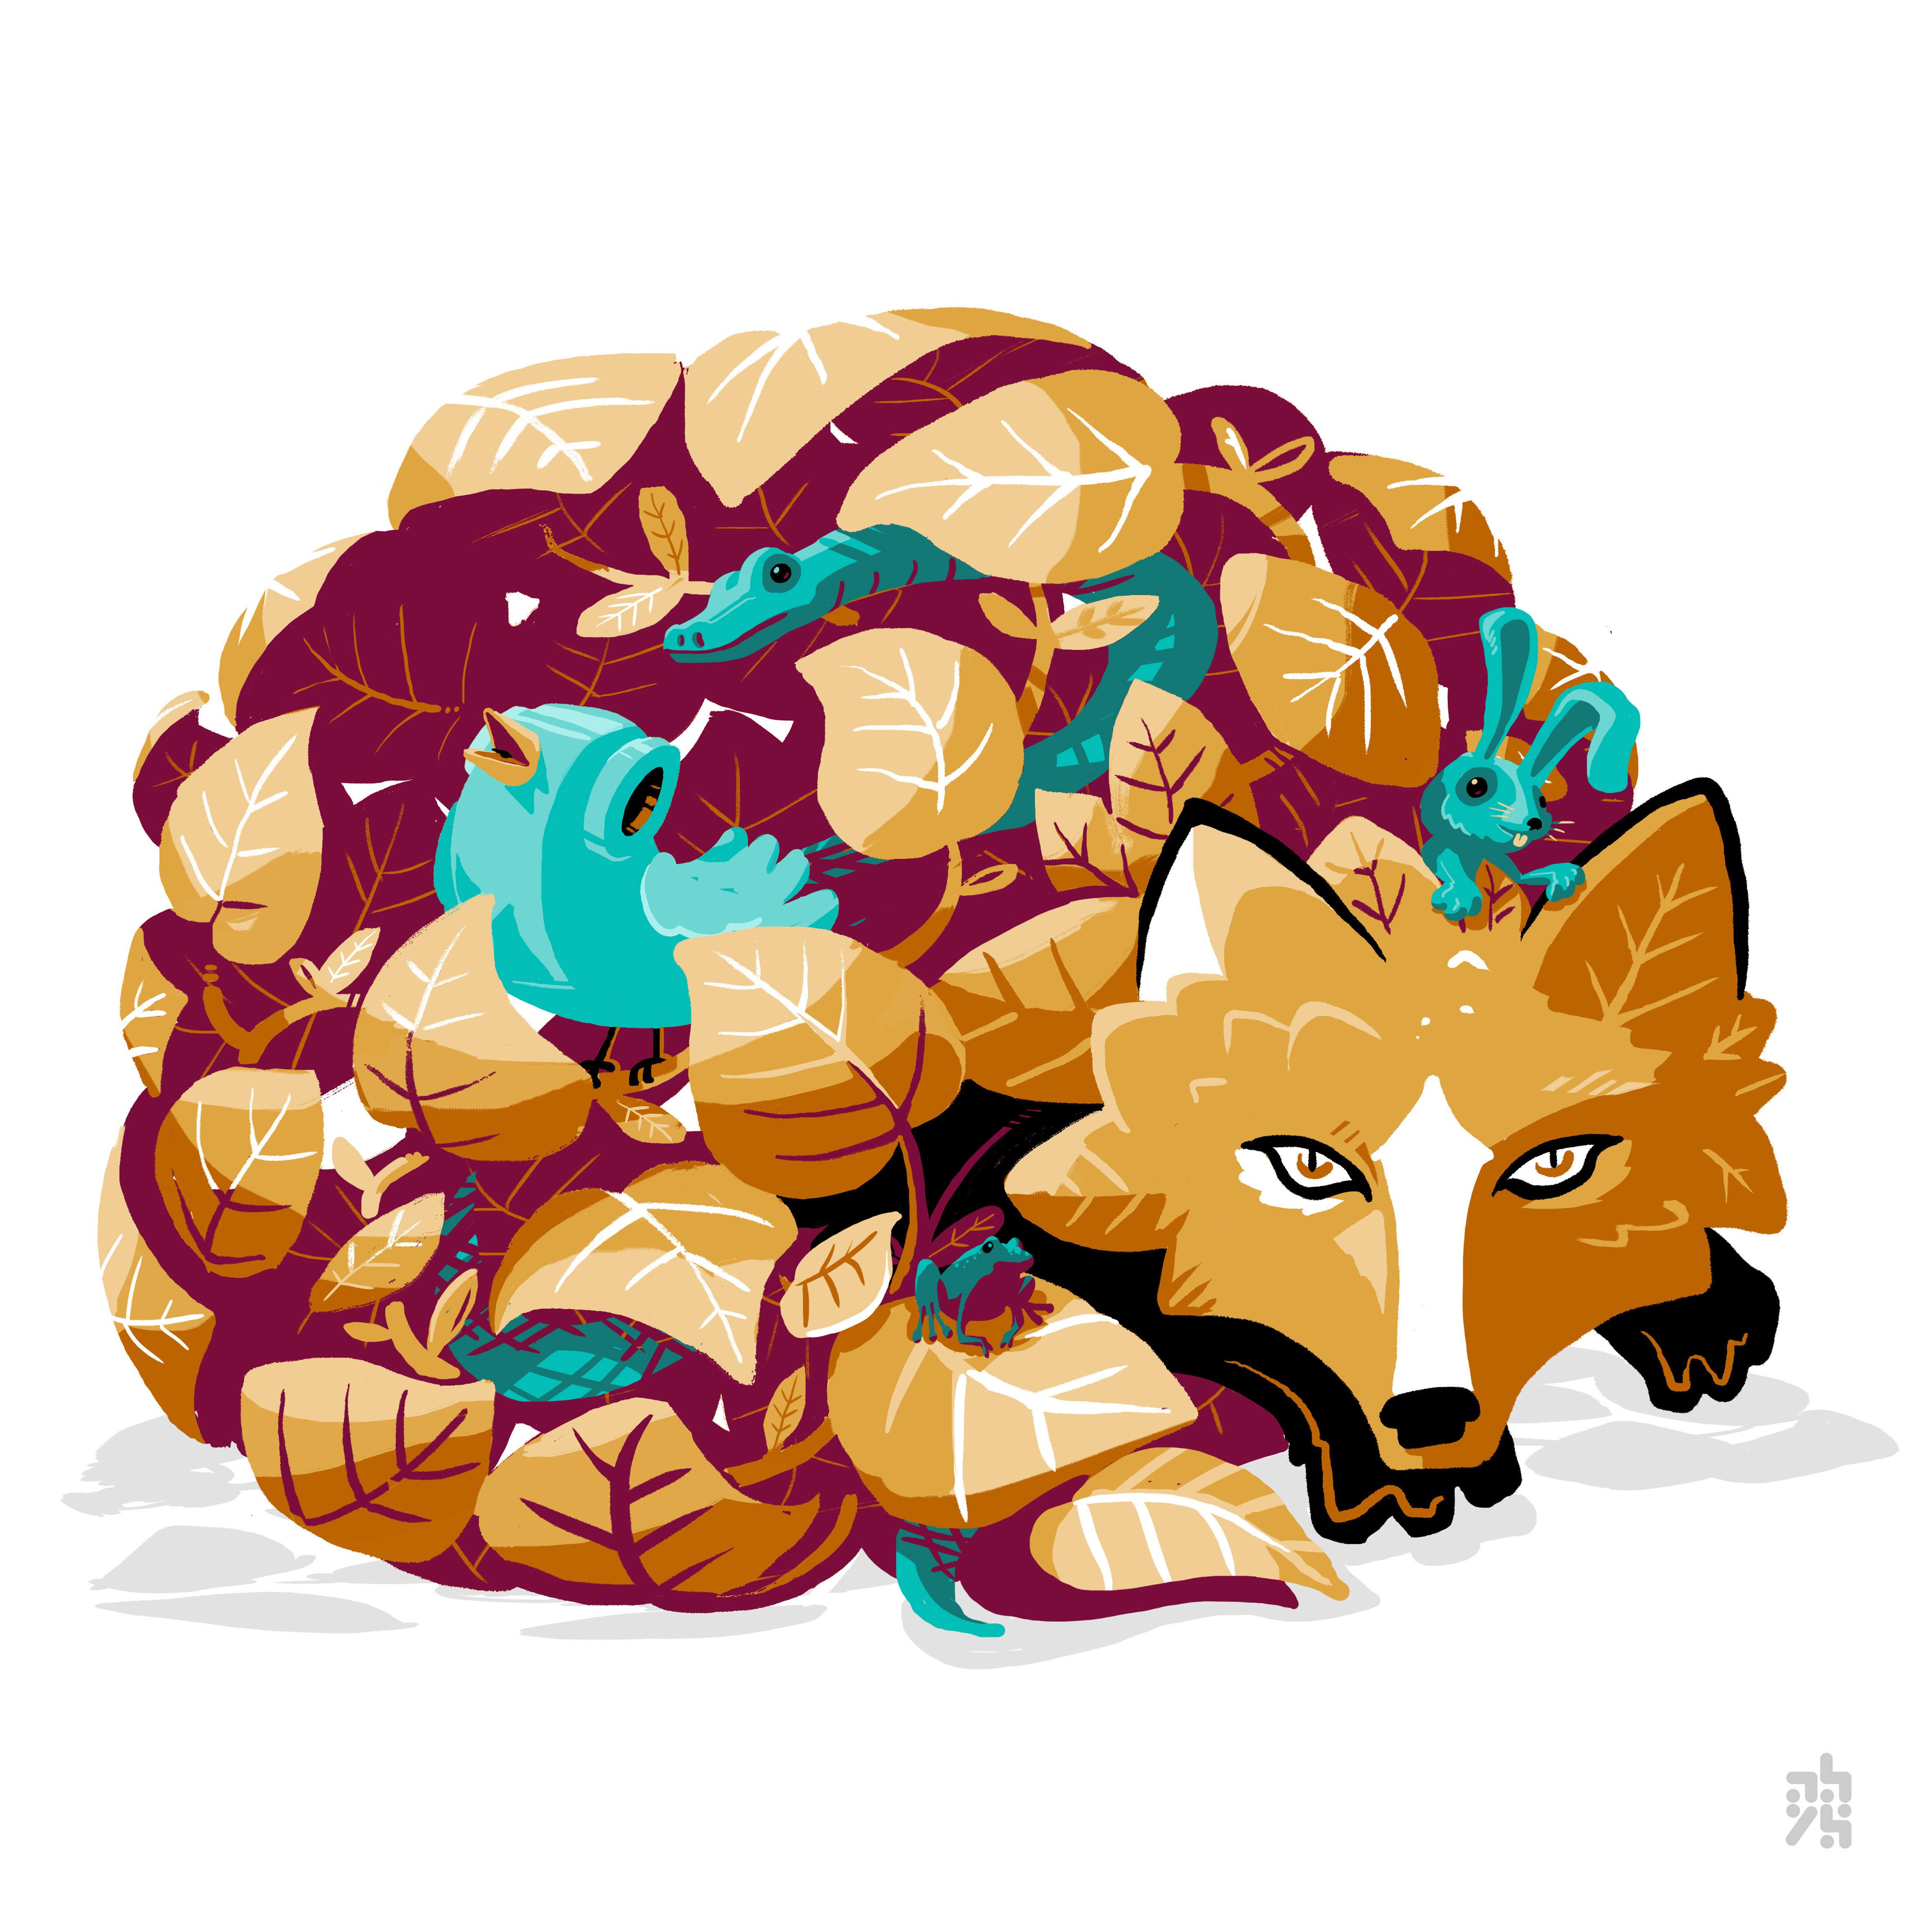 abys-illustration numerique -lyon fox meta bird